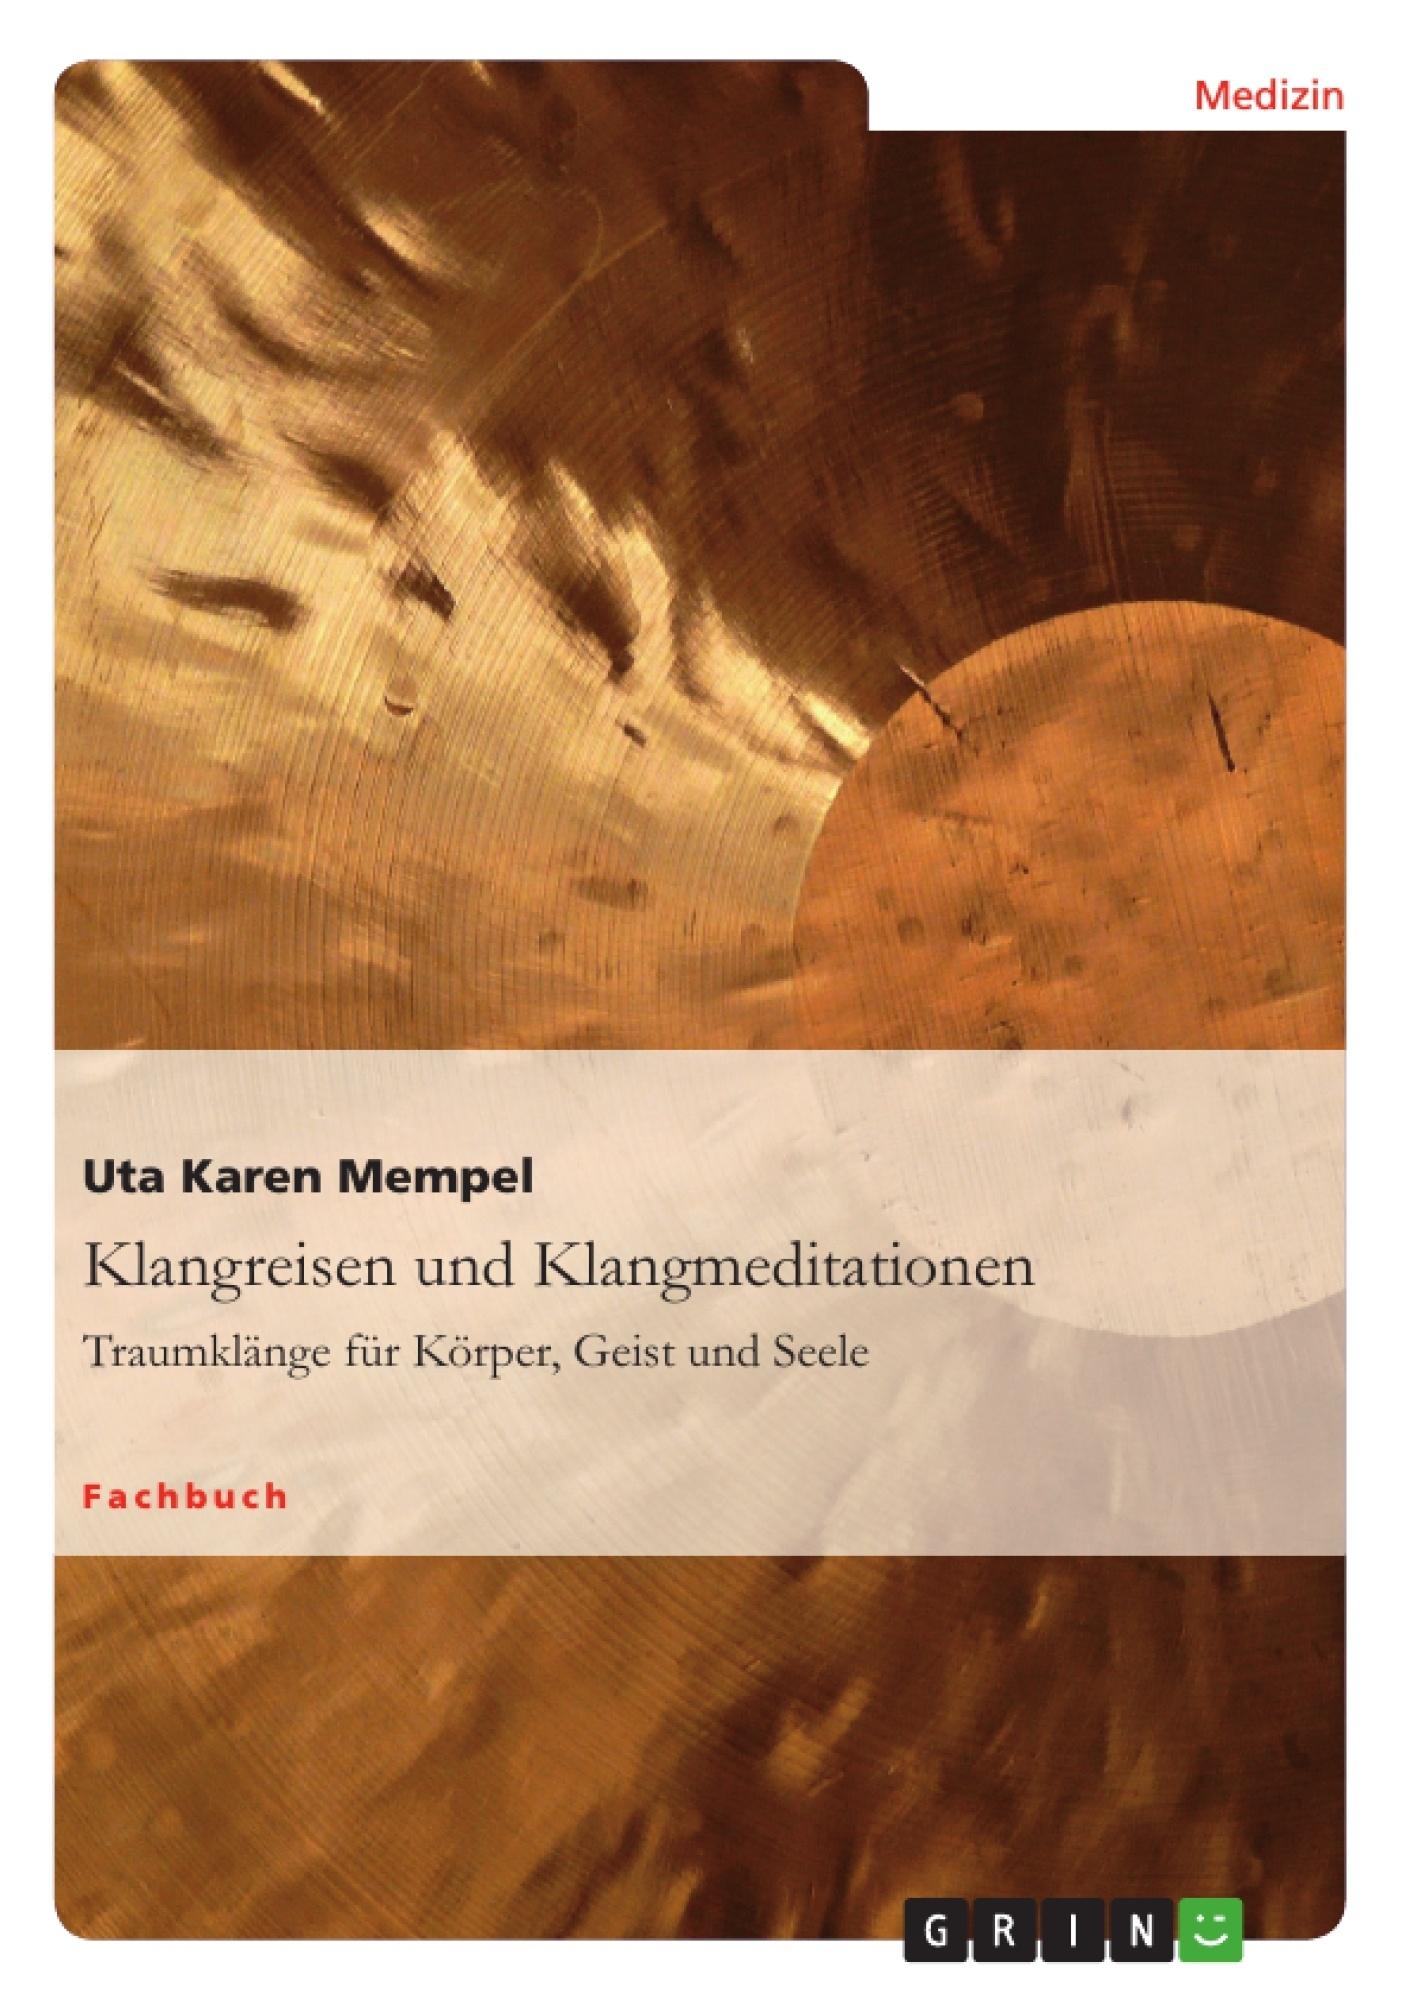 Titel: Klangreisen und Klangmeditationen